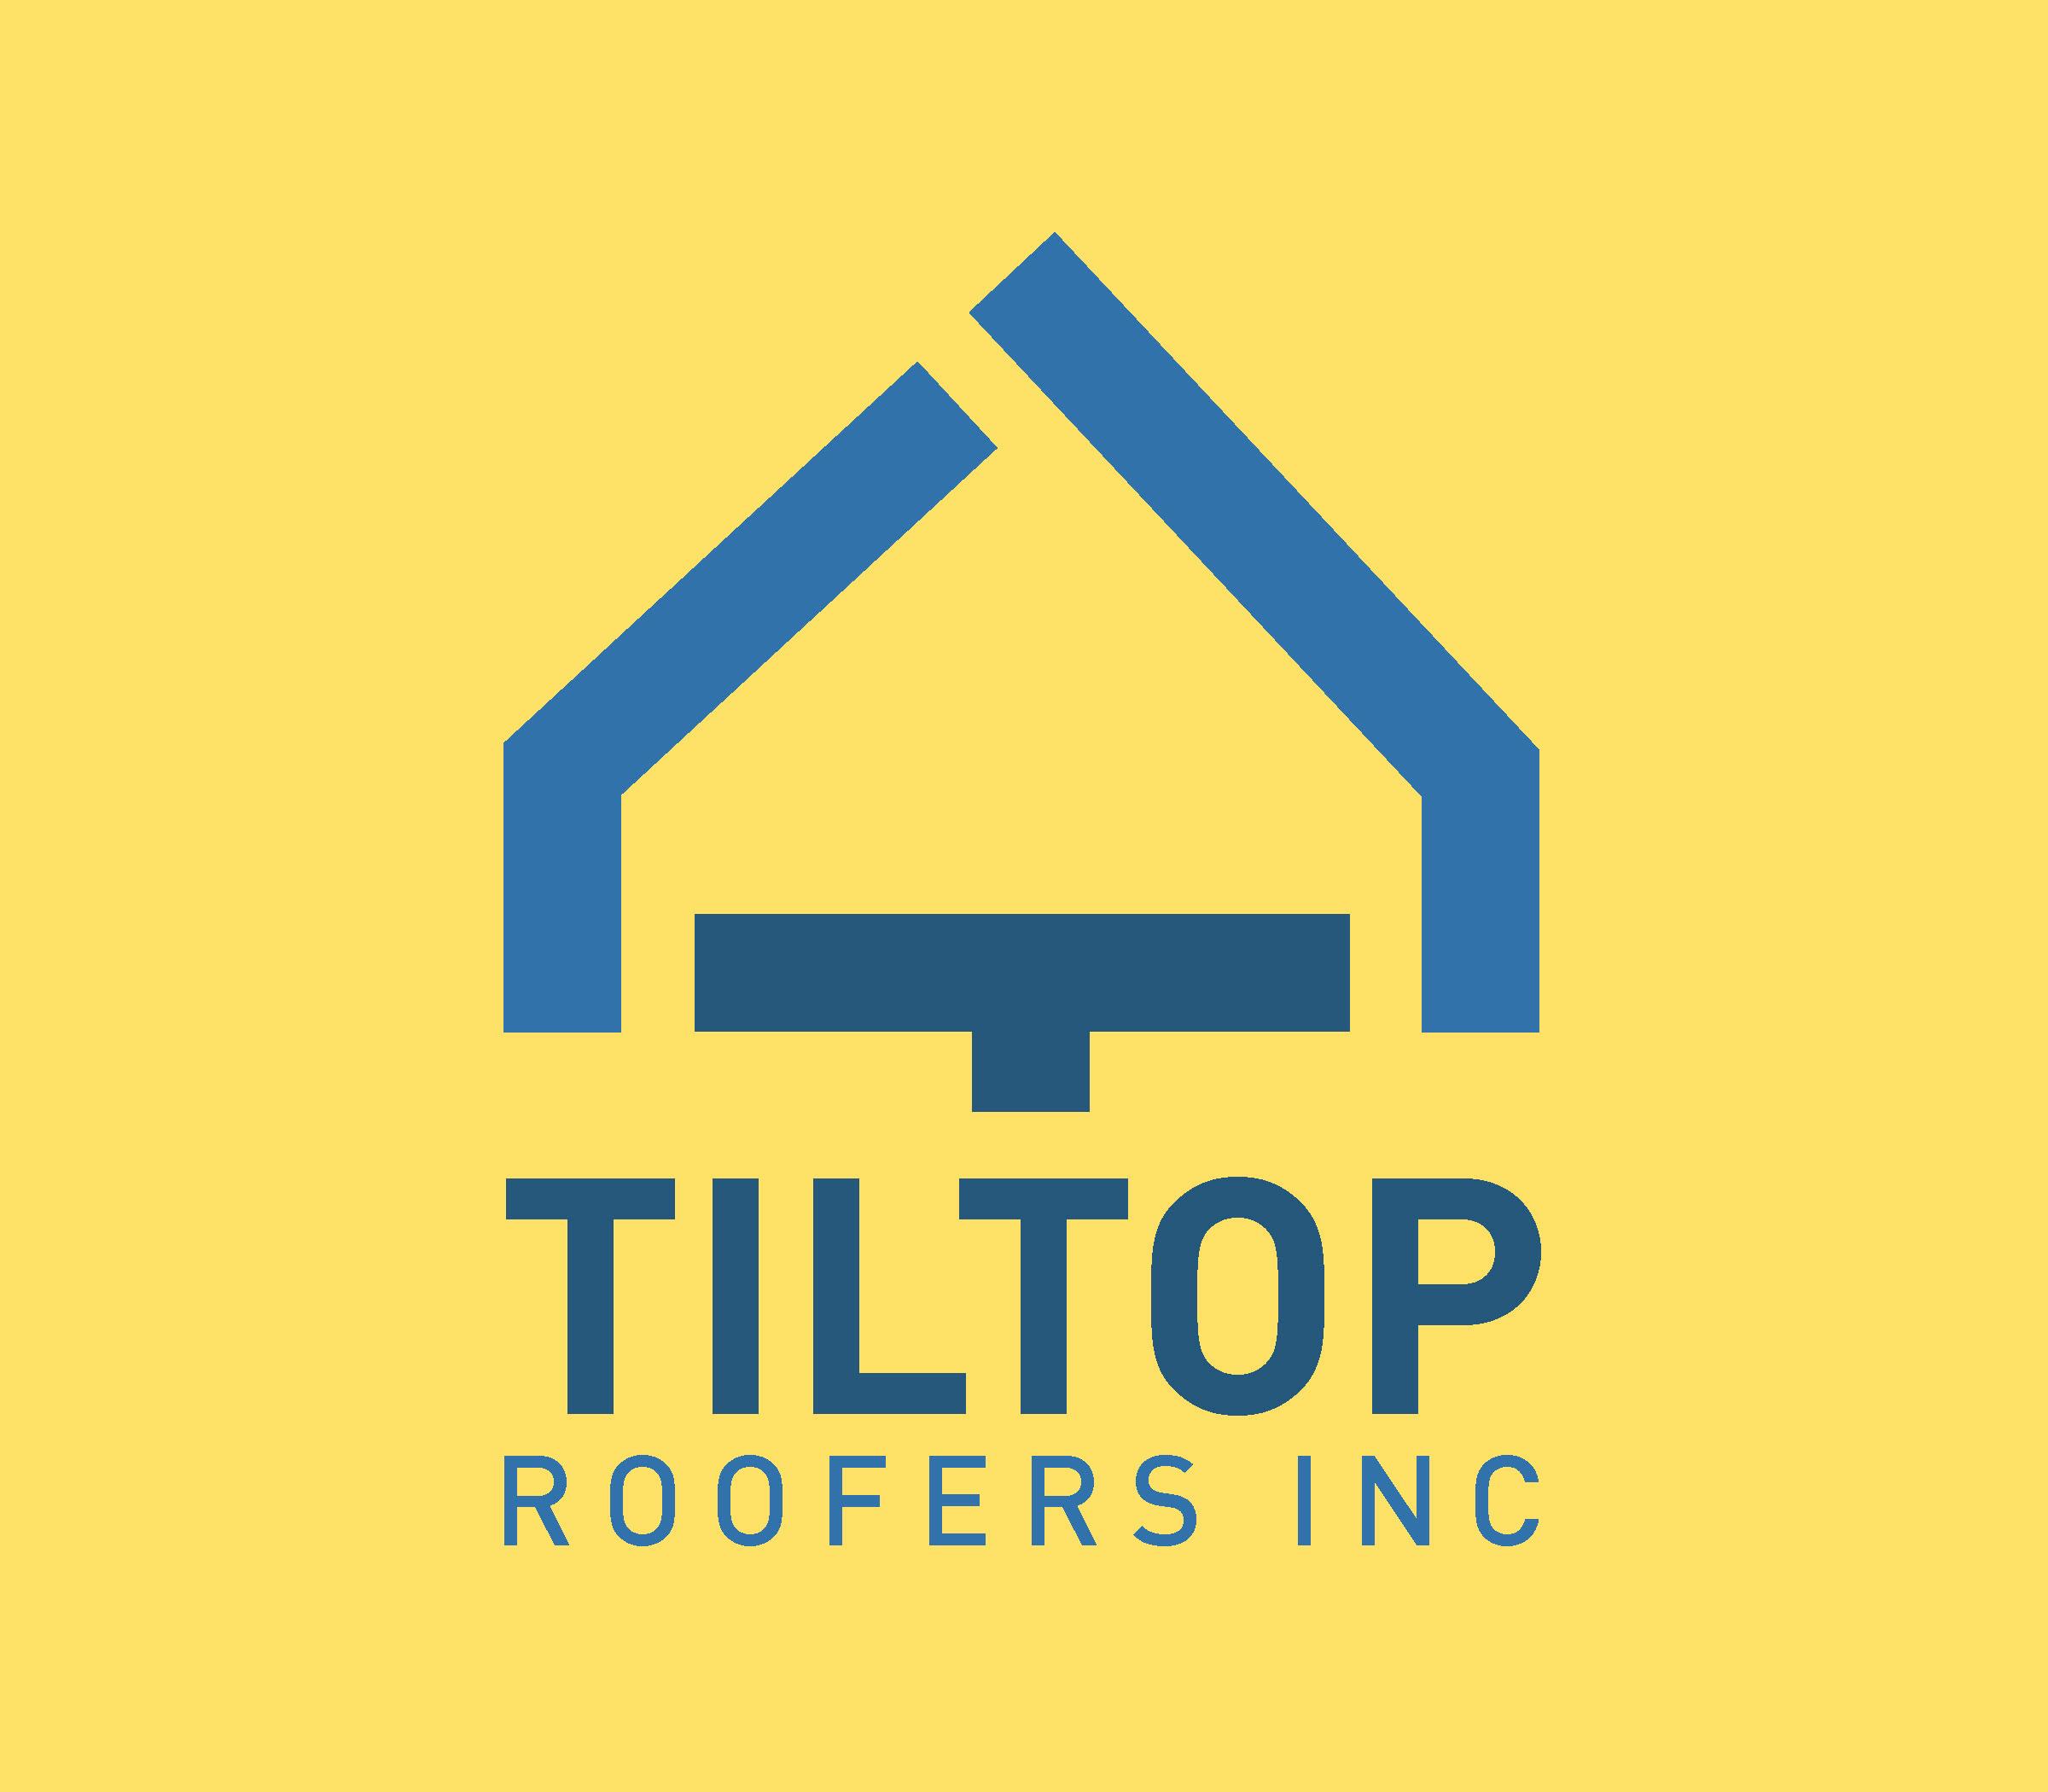 Roofing Contractors Professional Affordable Tiltop